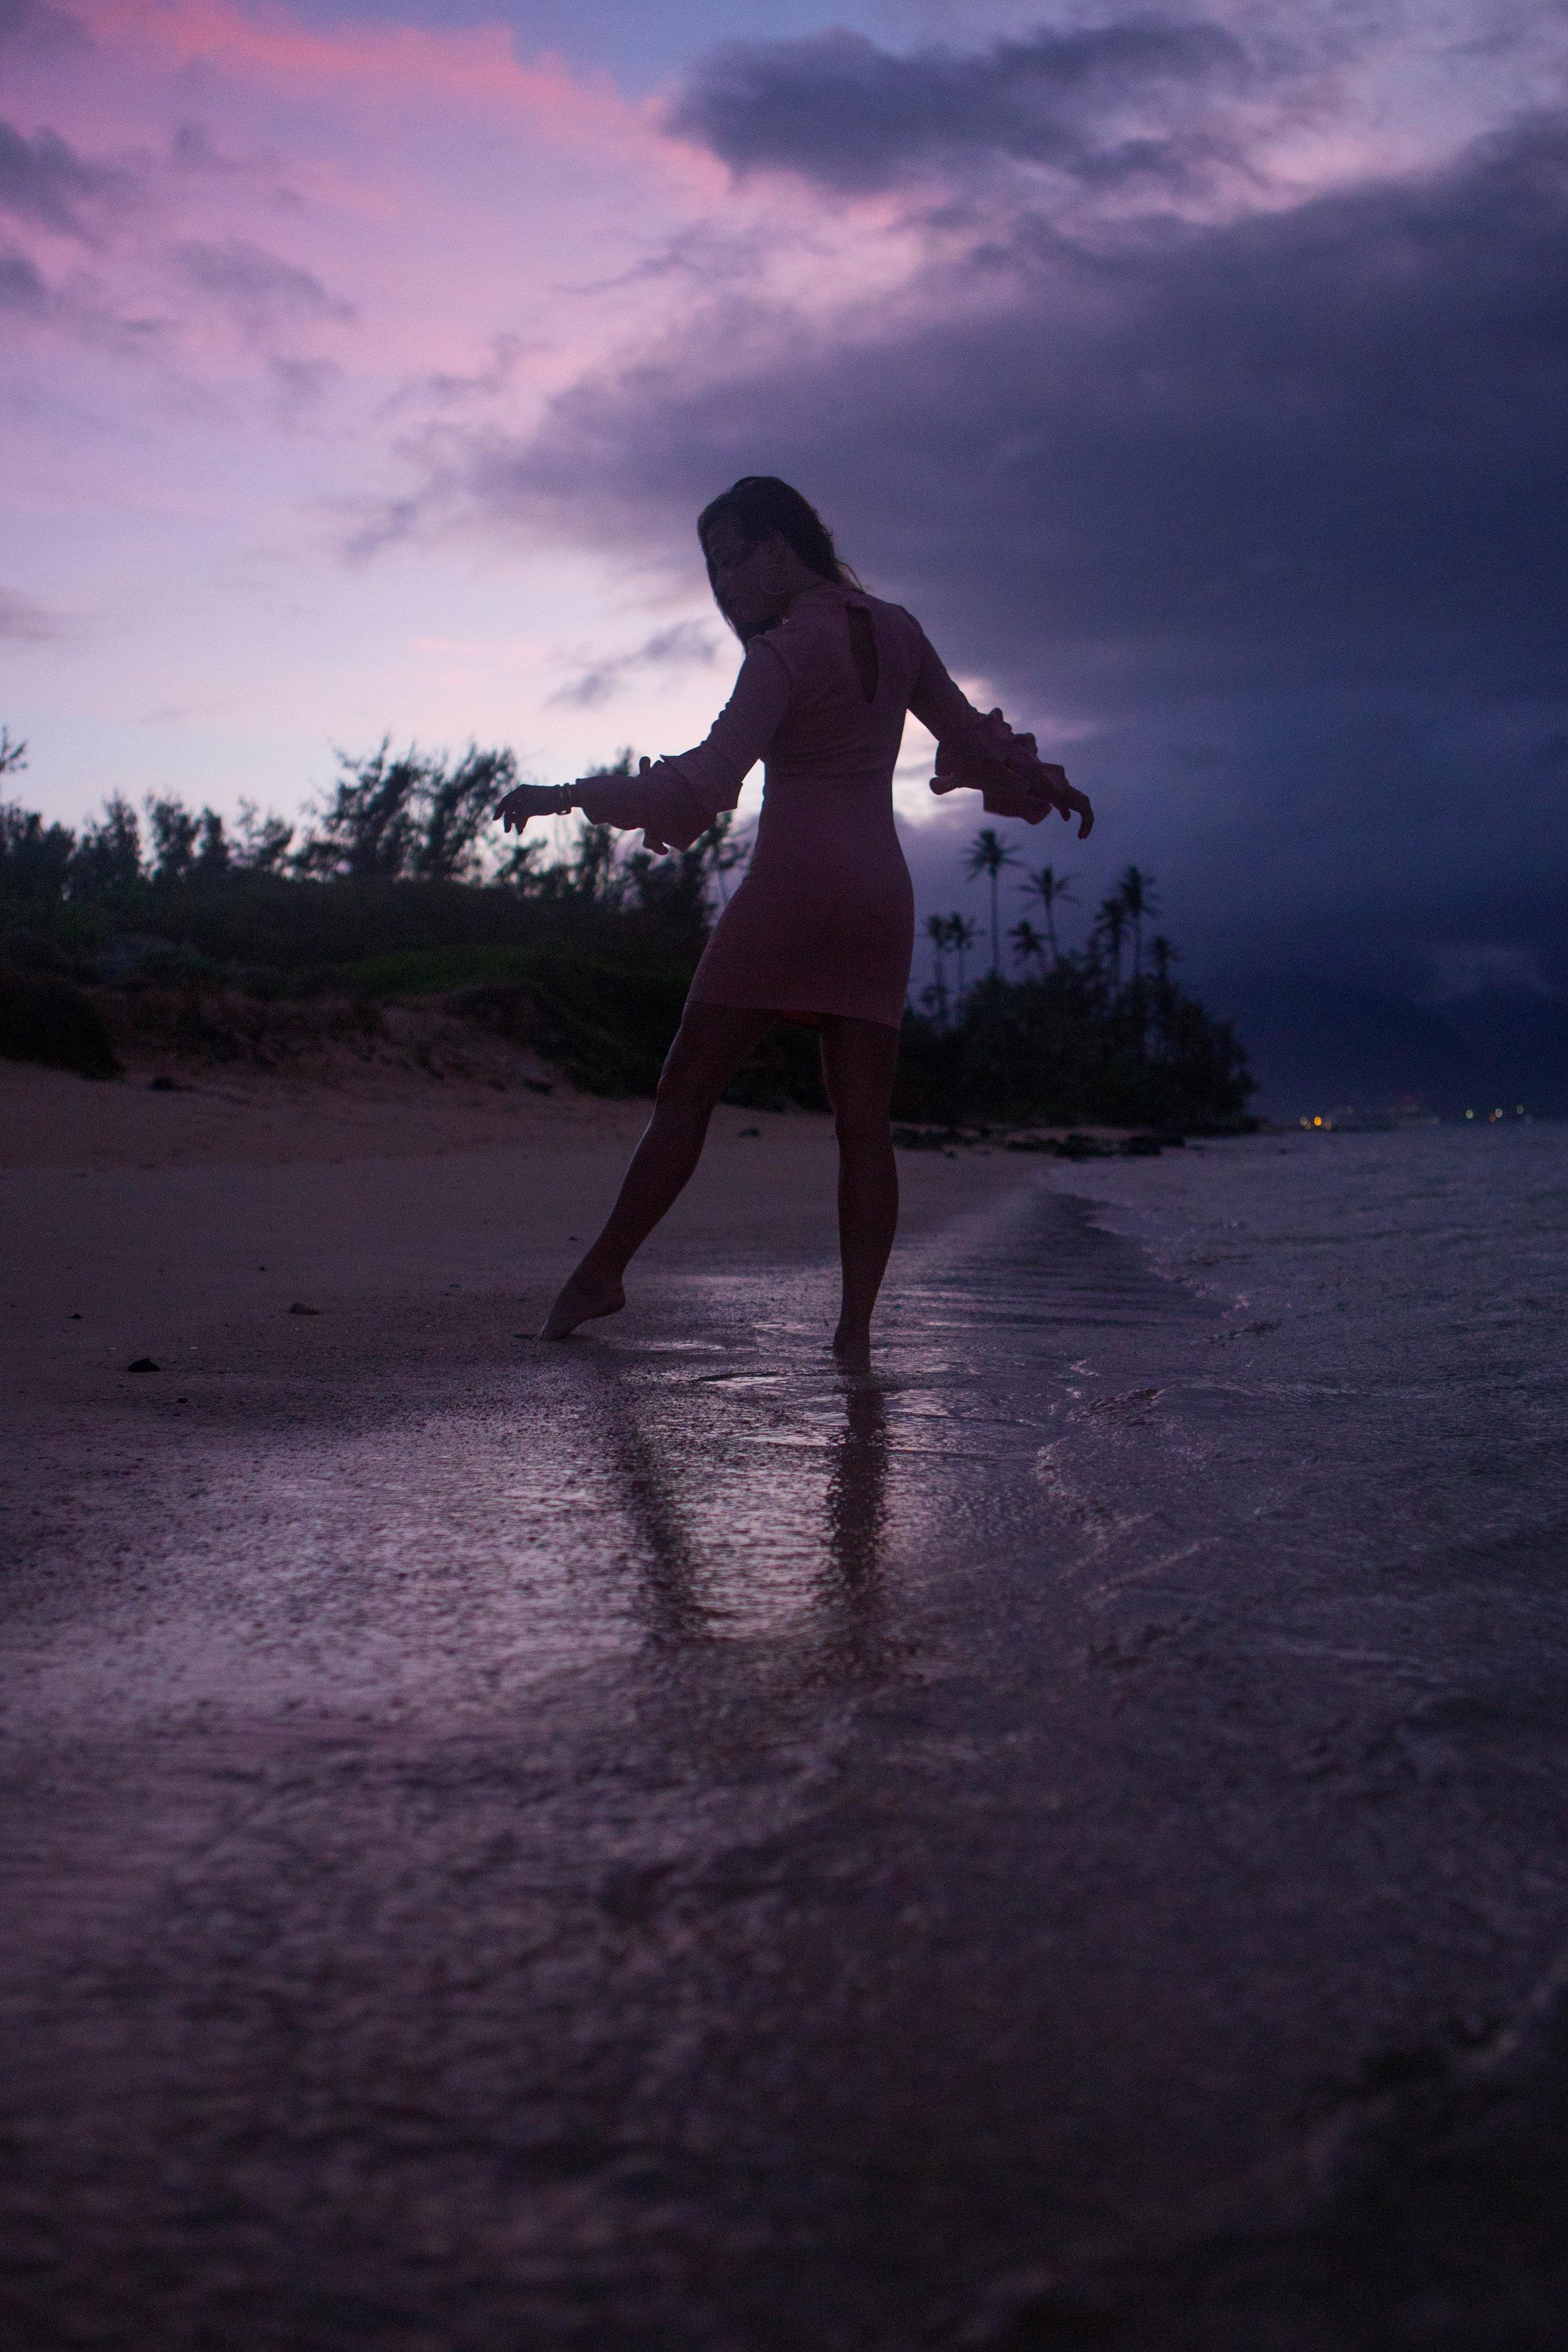 AstroBandit_Maui_Hawaii_JordanRose_NorthShore_Sunset_43.jpg